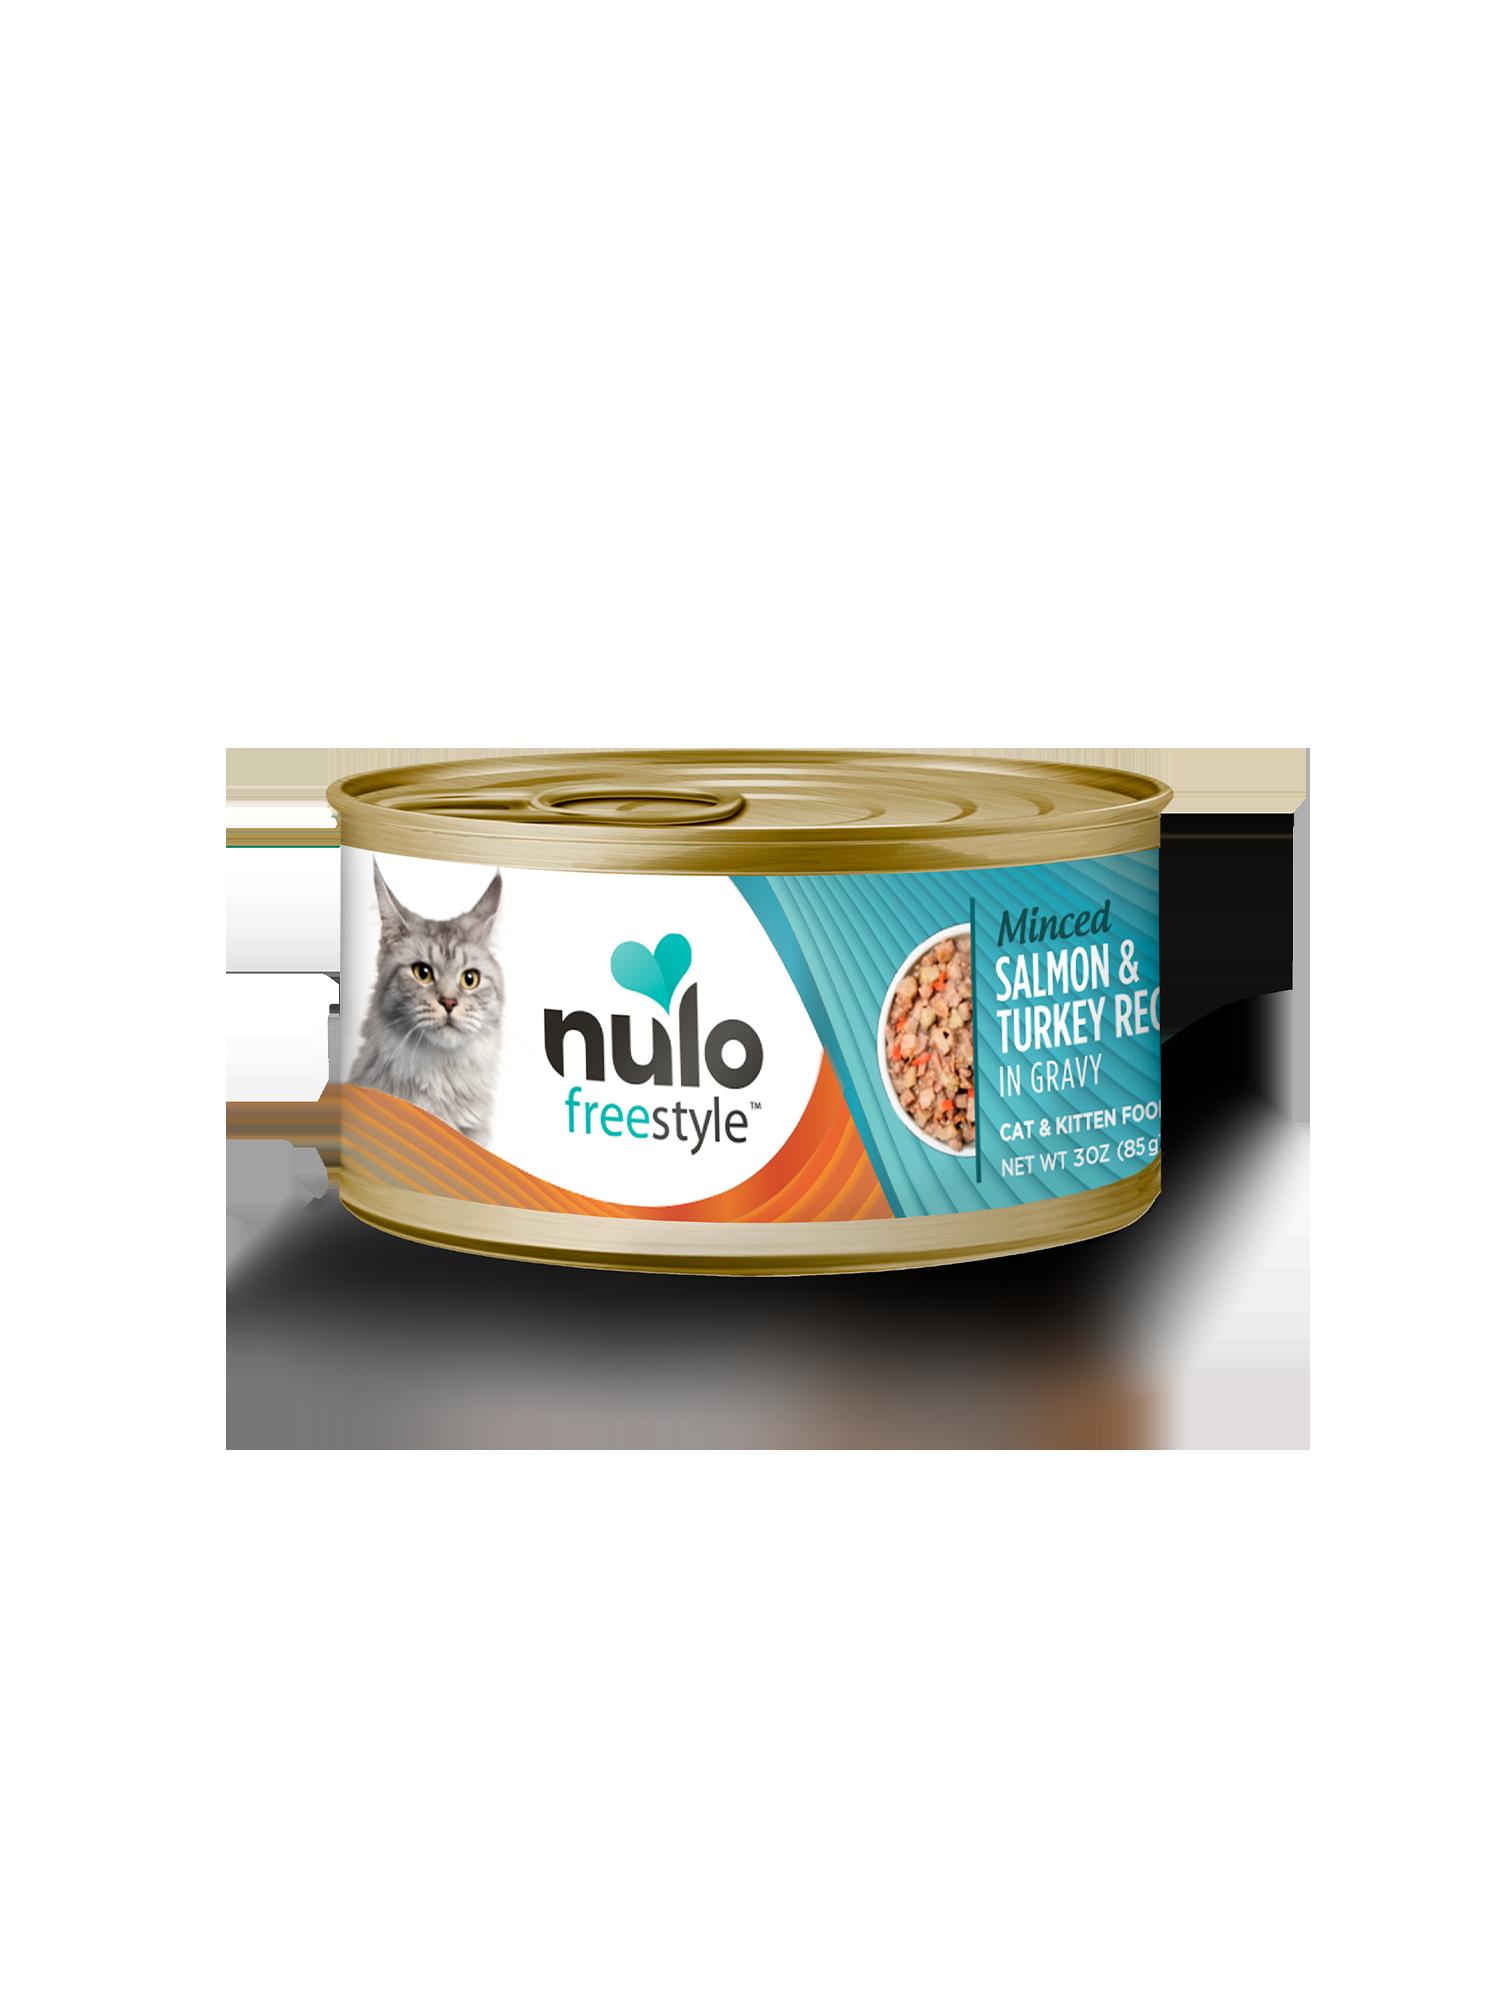 Nulo Nulo Freestyle Minced Salmon & Turkey Wet Cat Food 3oz